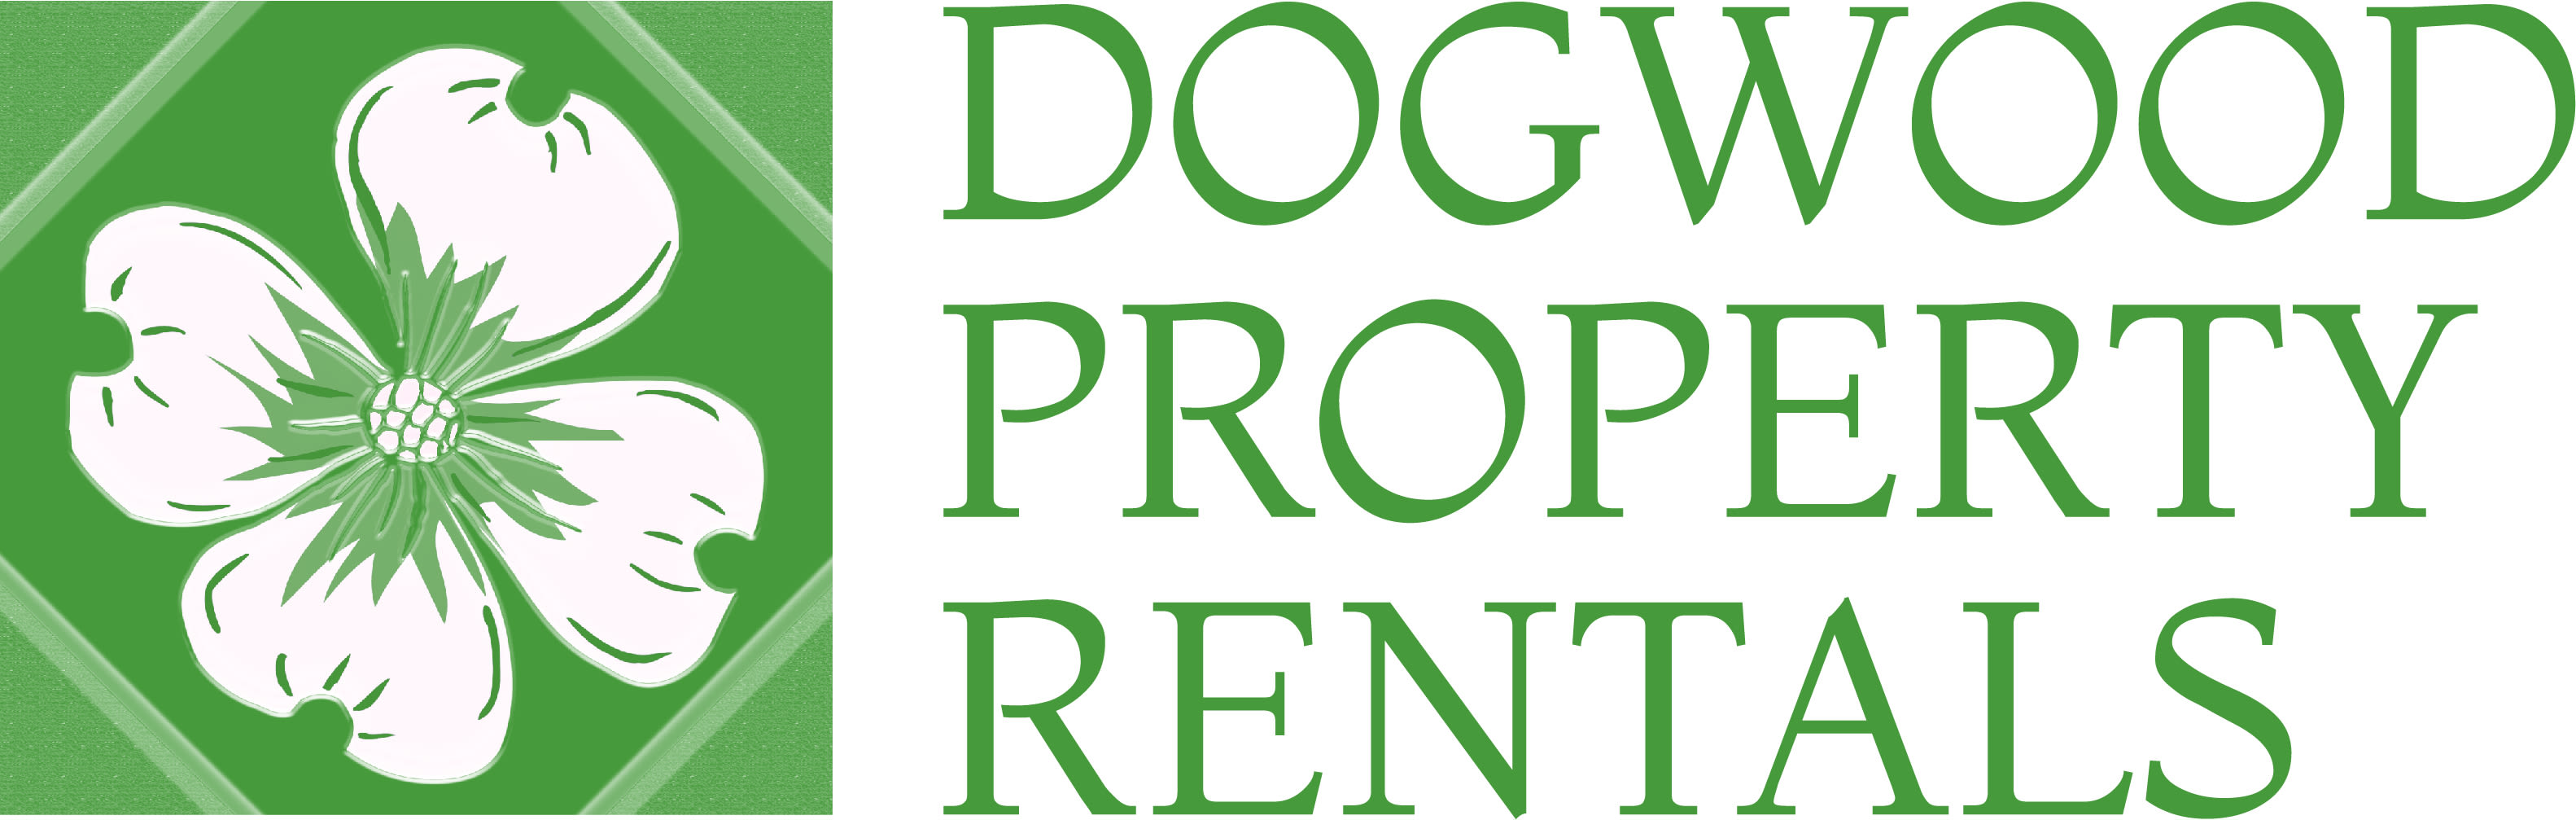 DOGWOOD PROPERTY RENTALS